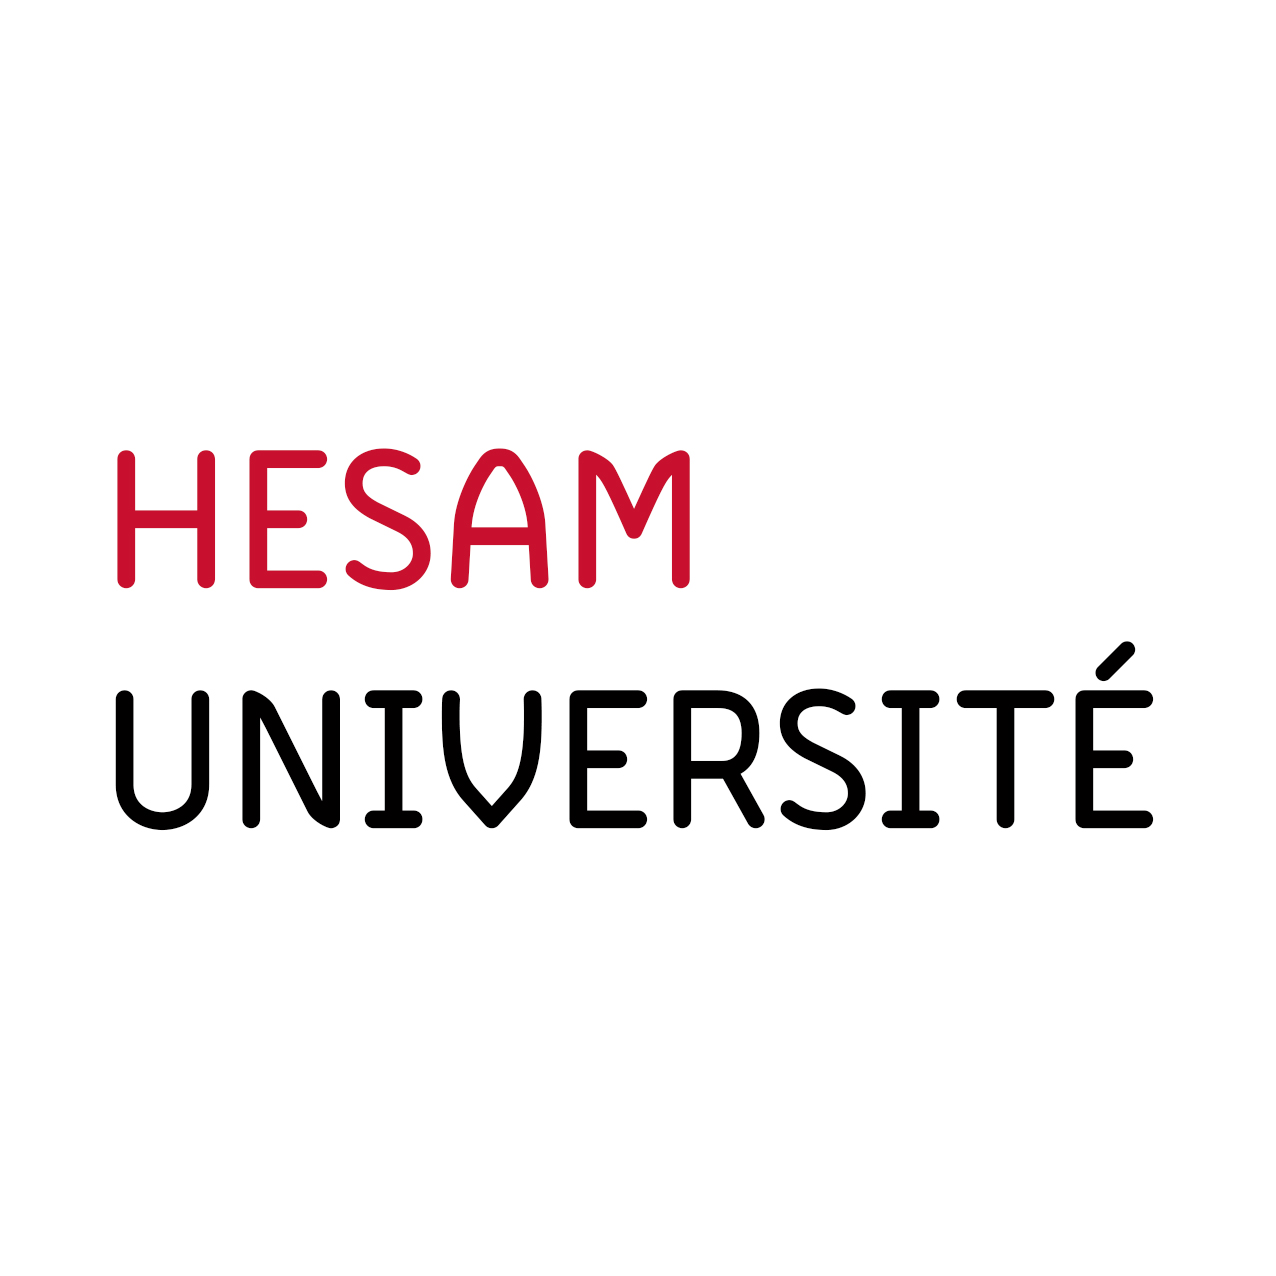 HESAM UNIVERSITE